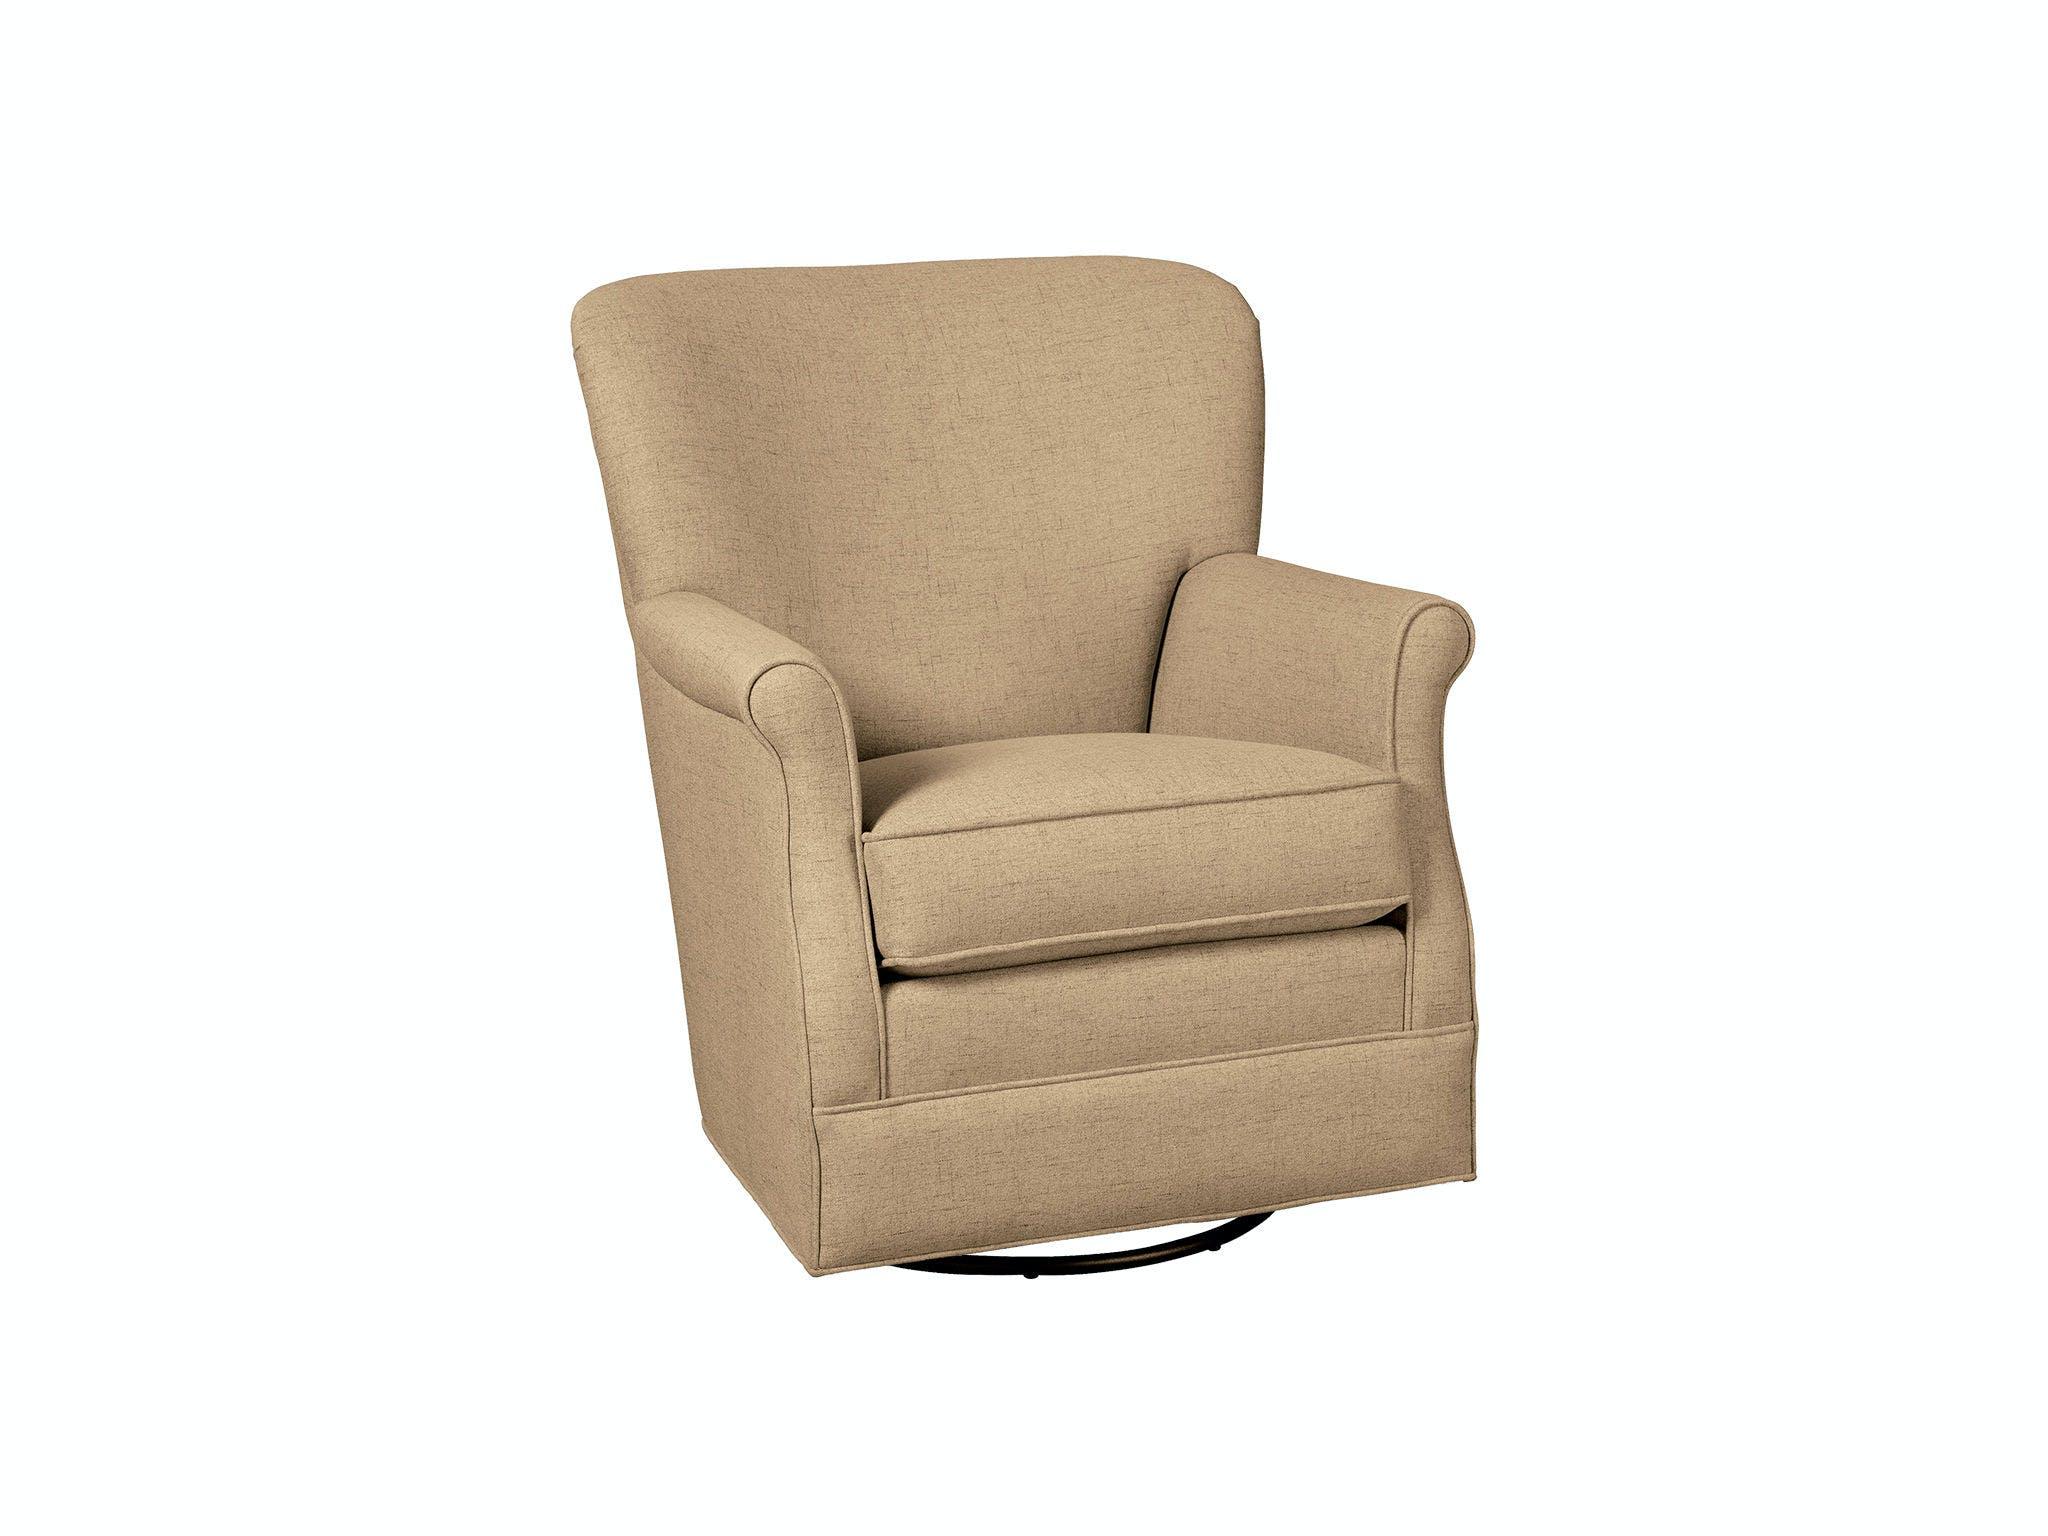 Cozy Life Living Room Swivel Glider Chair 075110sg